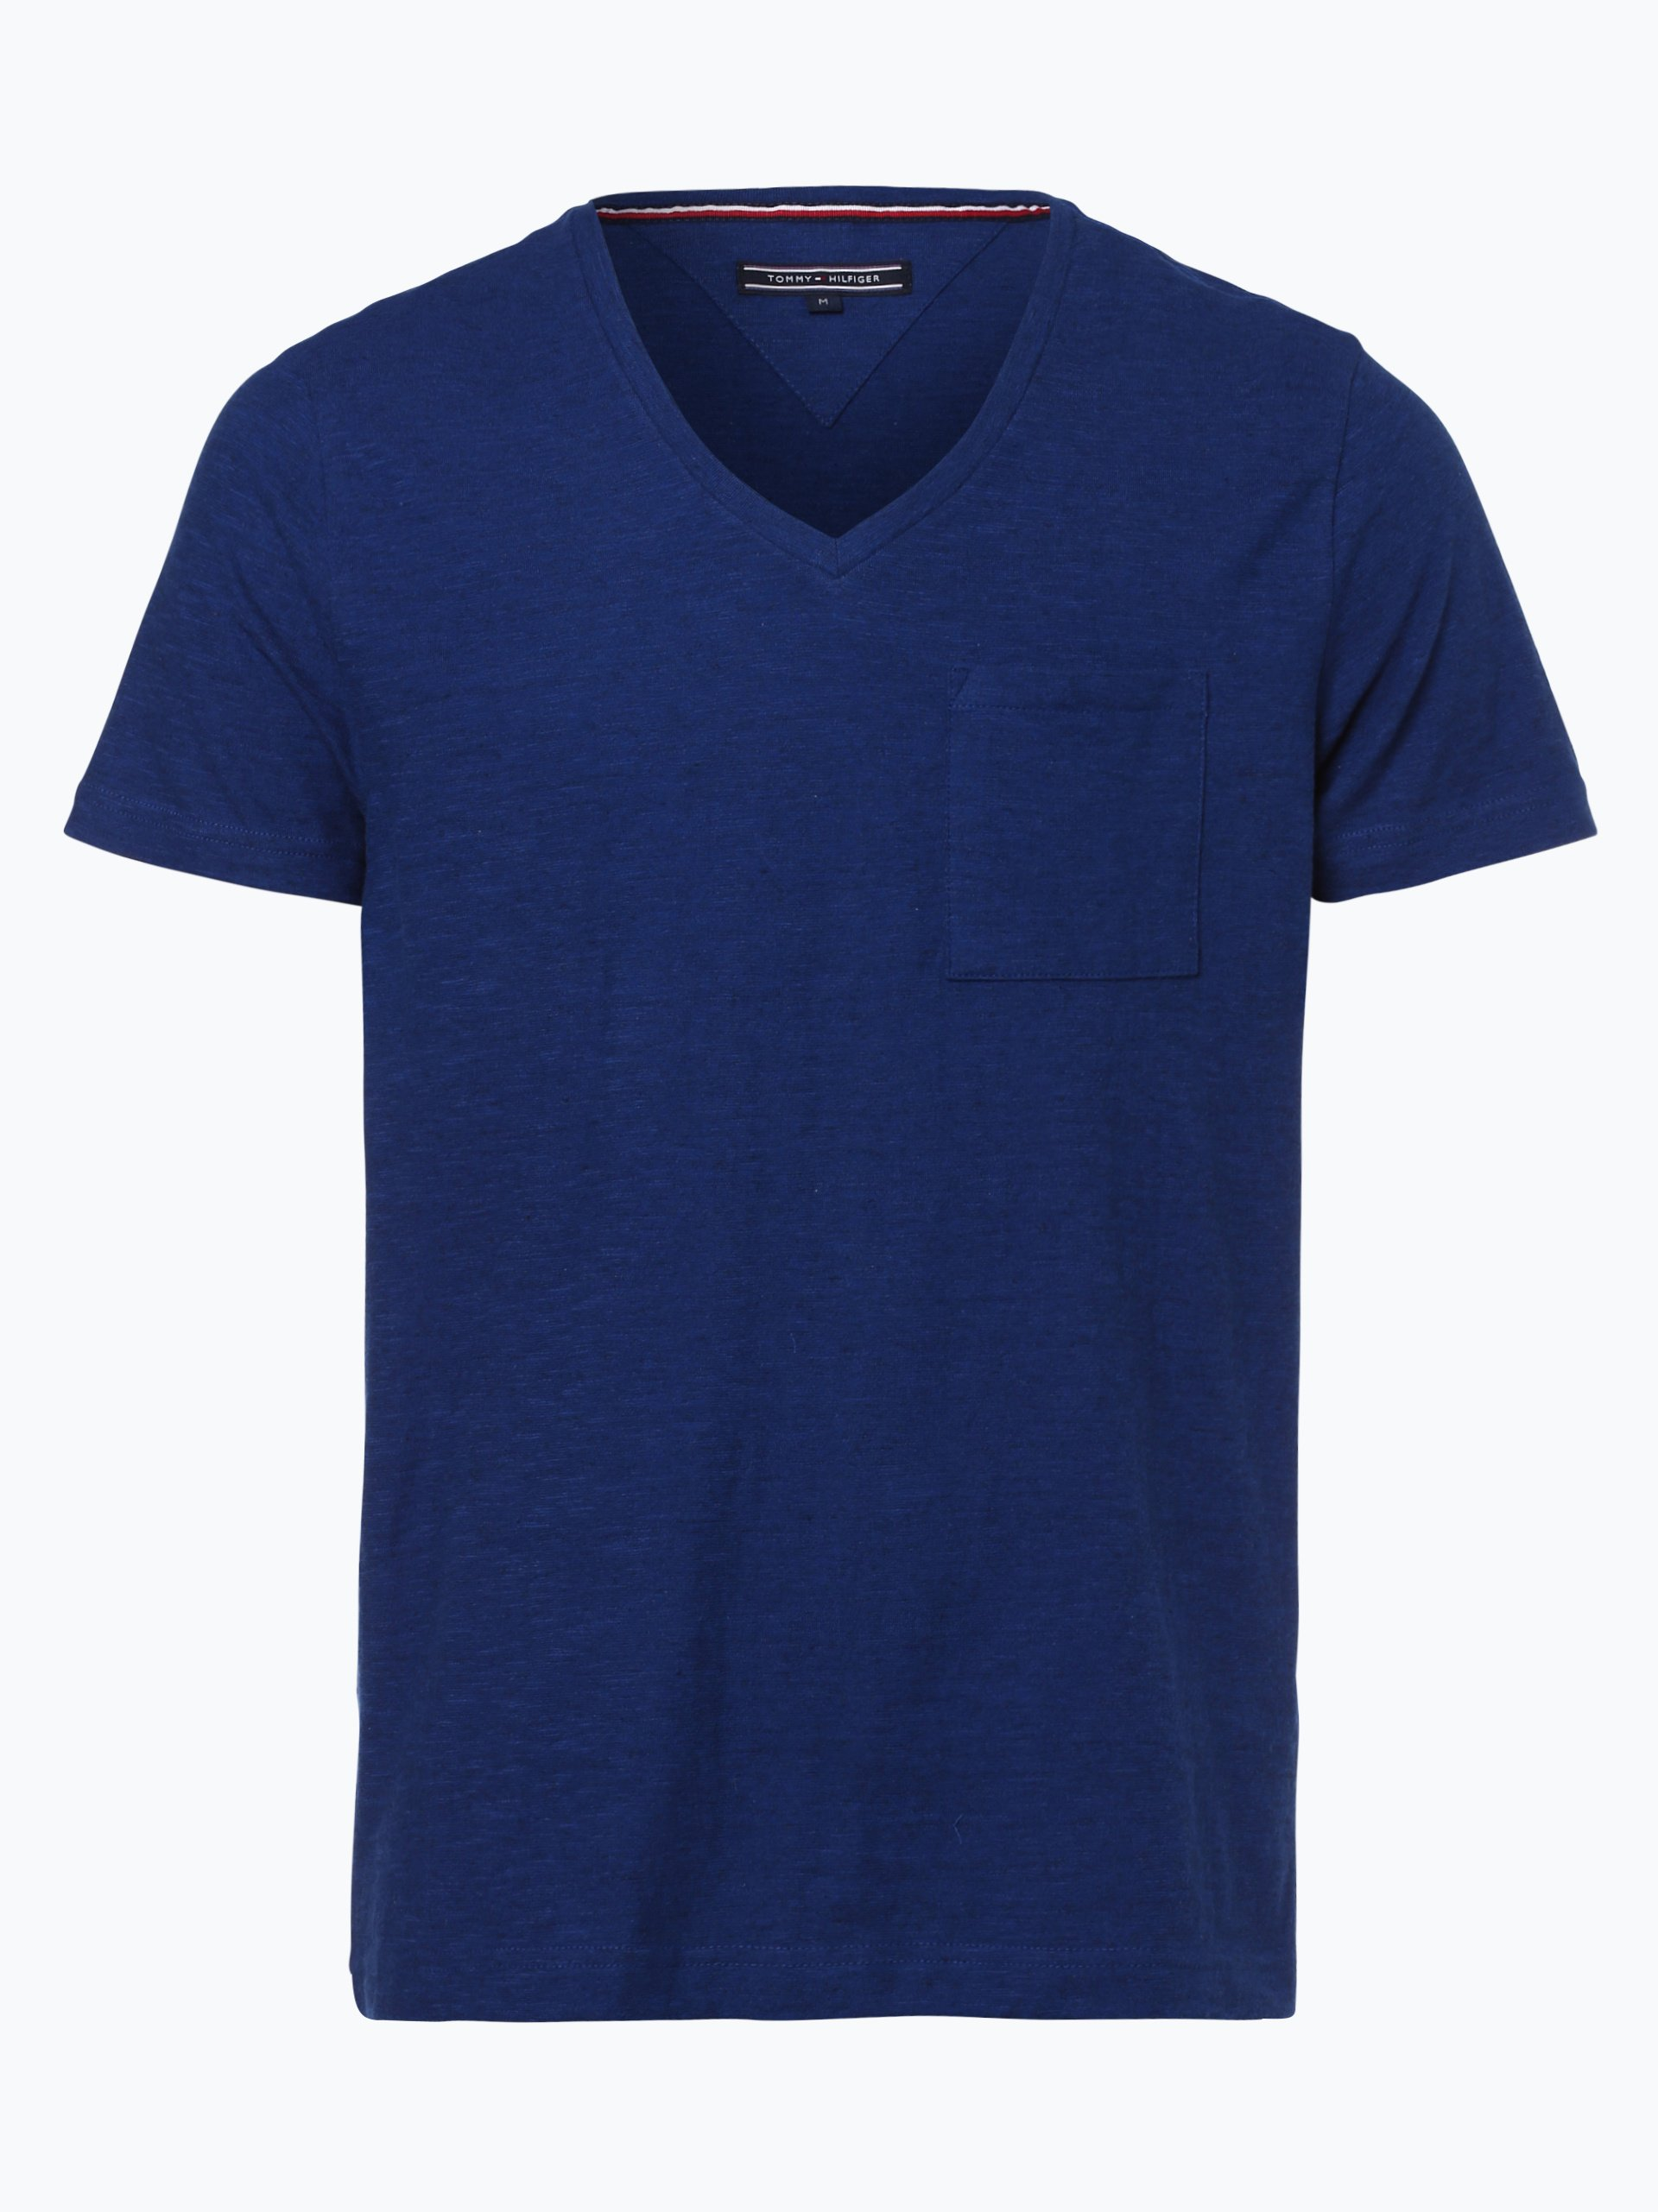 tommy hilfiger herren t shirt blau uni online kaufen. Black Bedroom Furniture Sets. Home Design Ideas